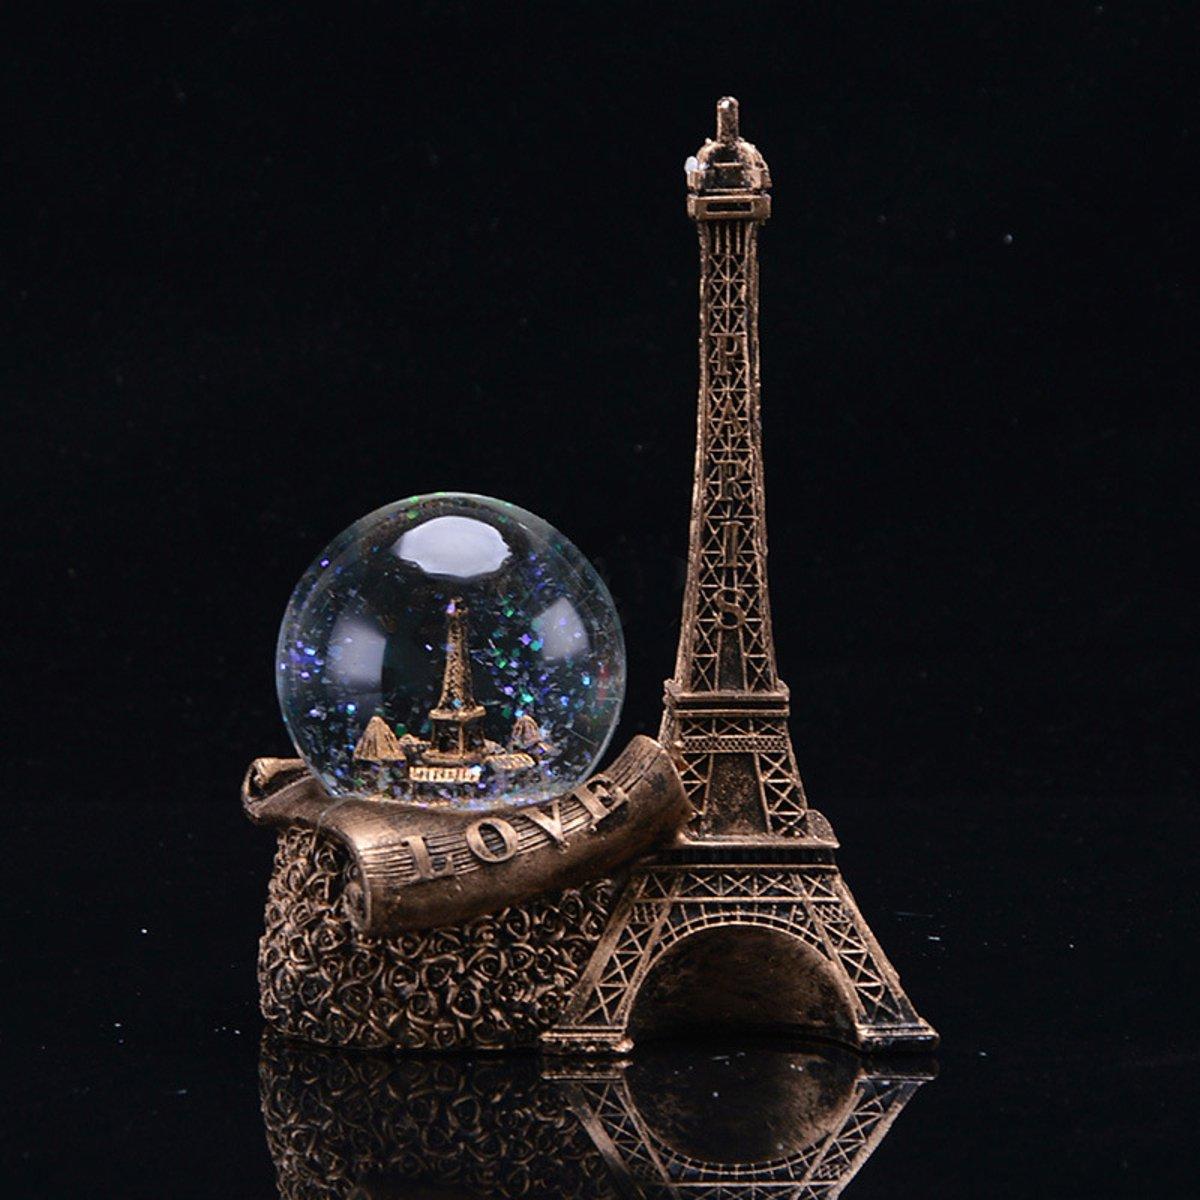 Vintage-Crystal-Ball-Paris-Eiffel-Tower-Model-Statue-Home-Desk-Decoration-Gift thumbnail 7